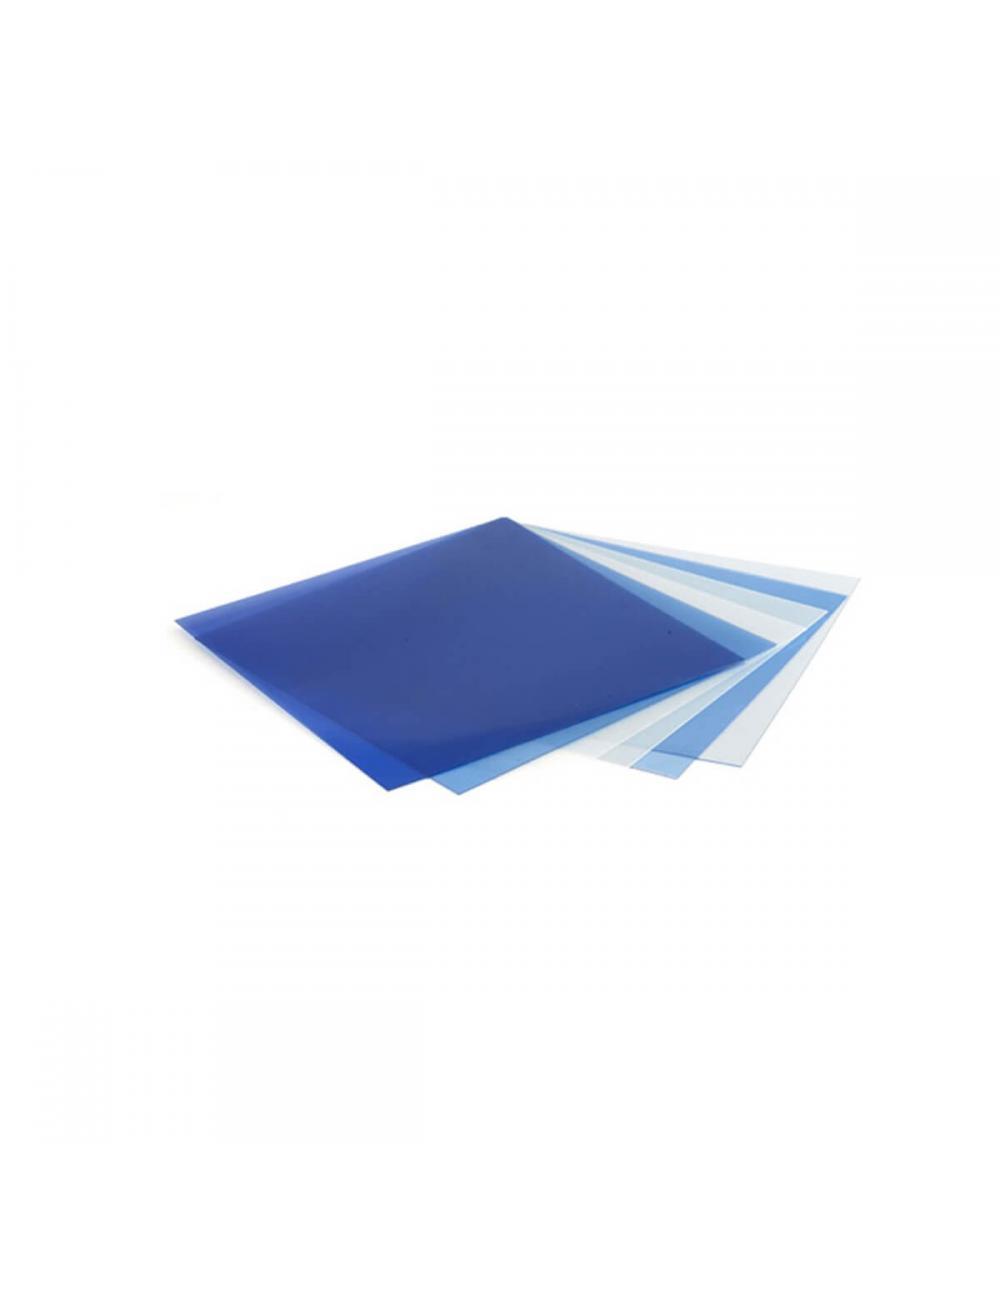 Litepanels - Set de 6 geles CTB para 1x1 con bolsa